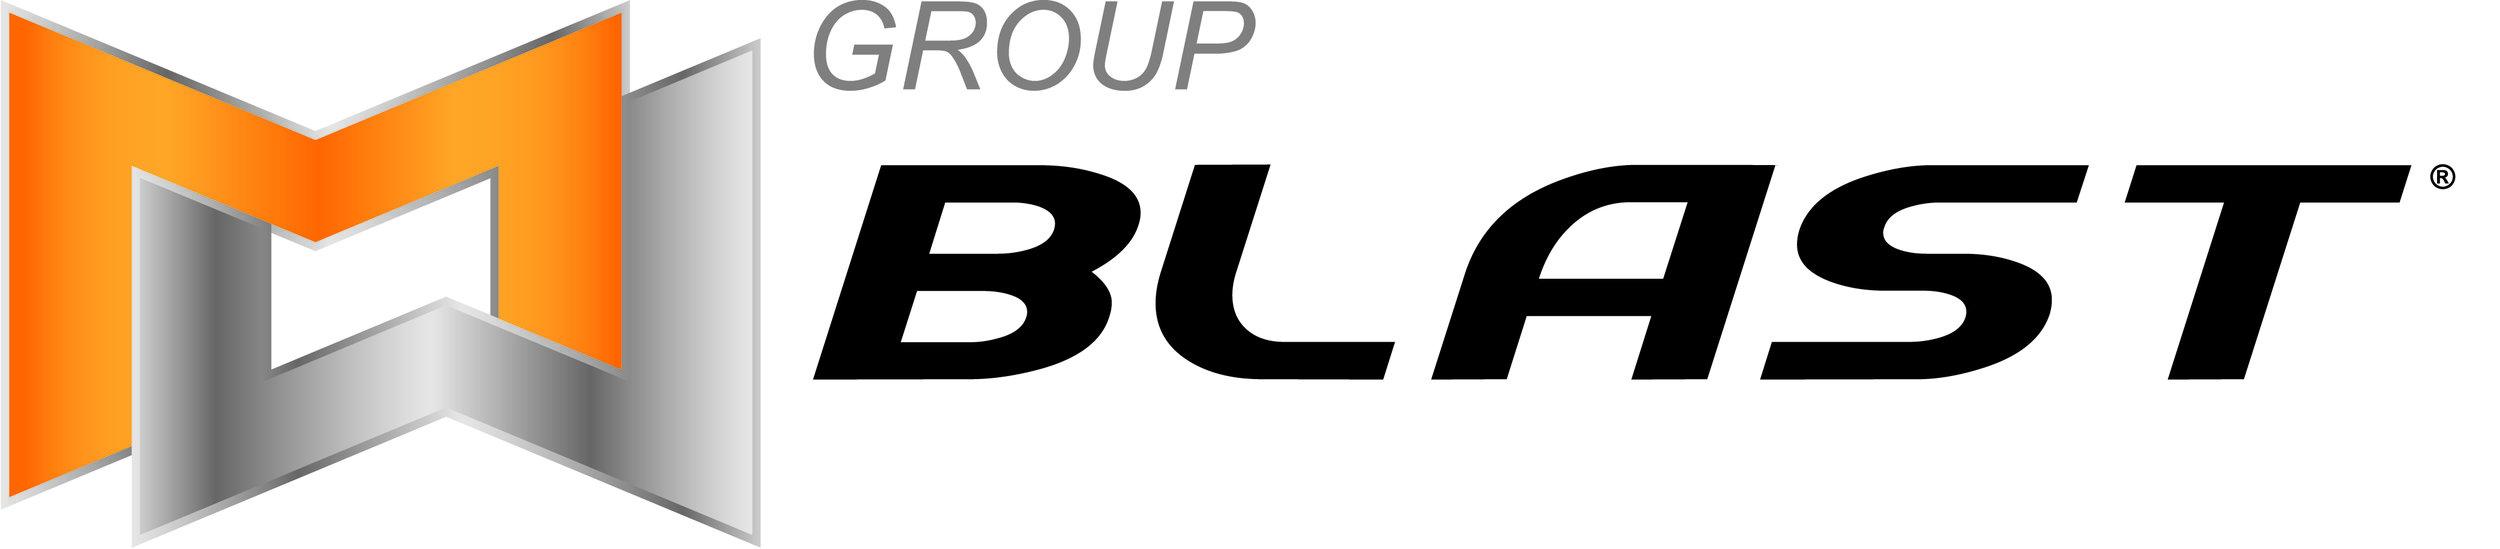 GB-MOSSA-FullLogo-CMYK-hires(1).jpg